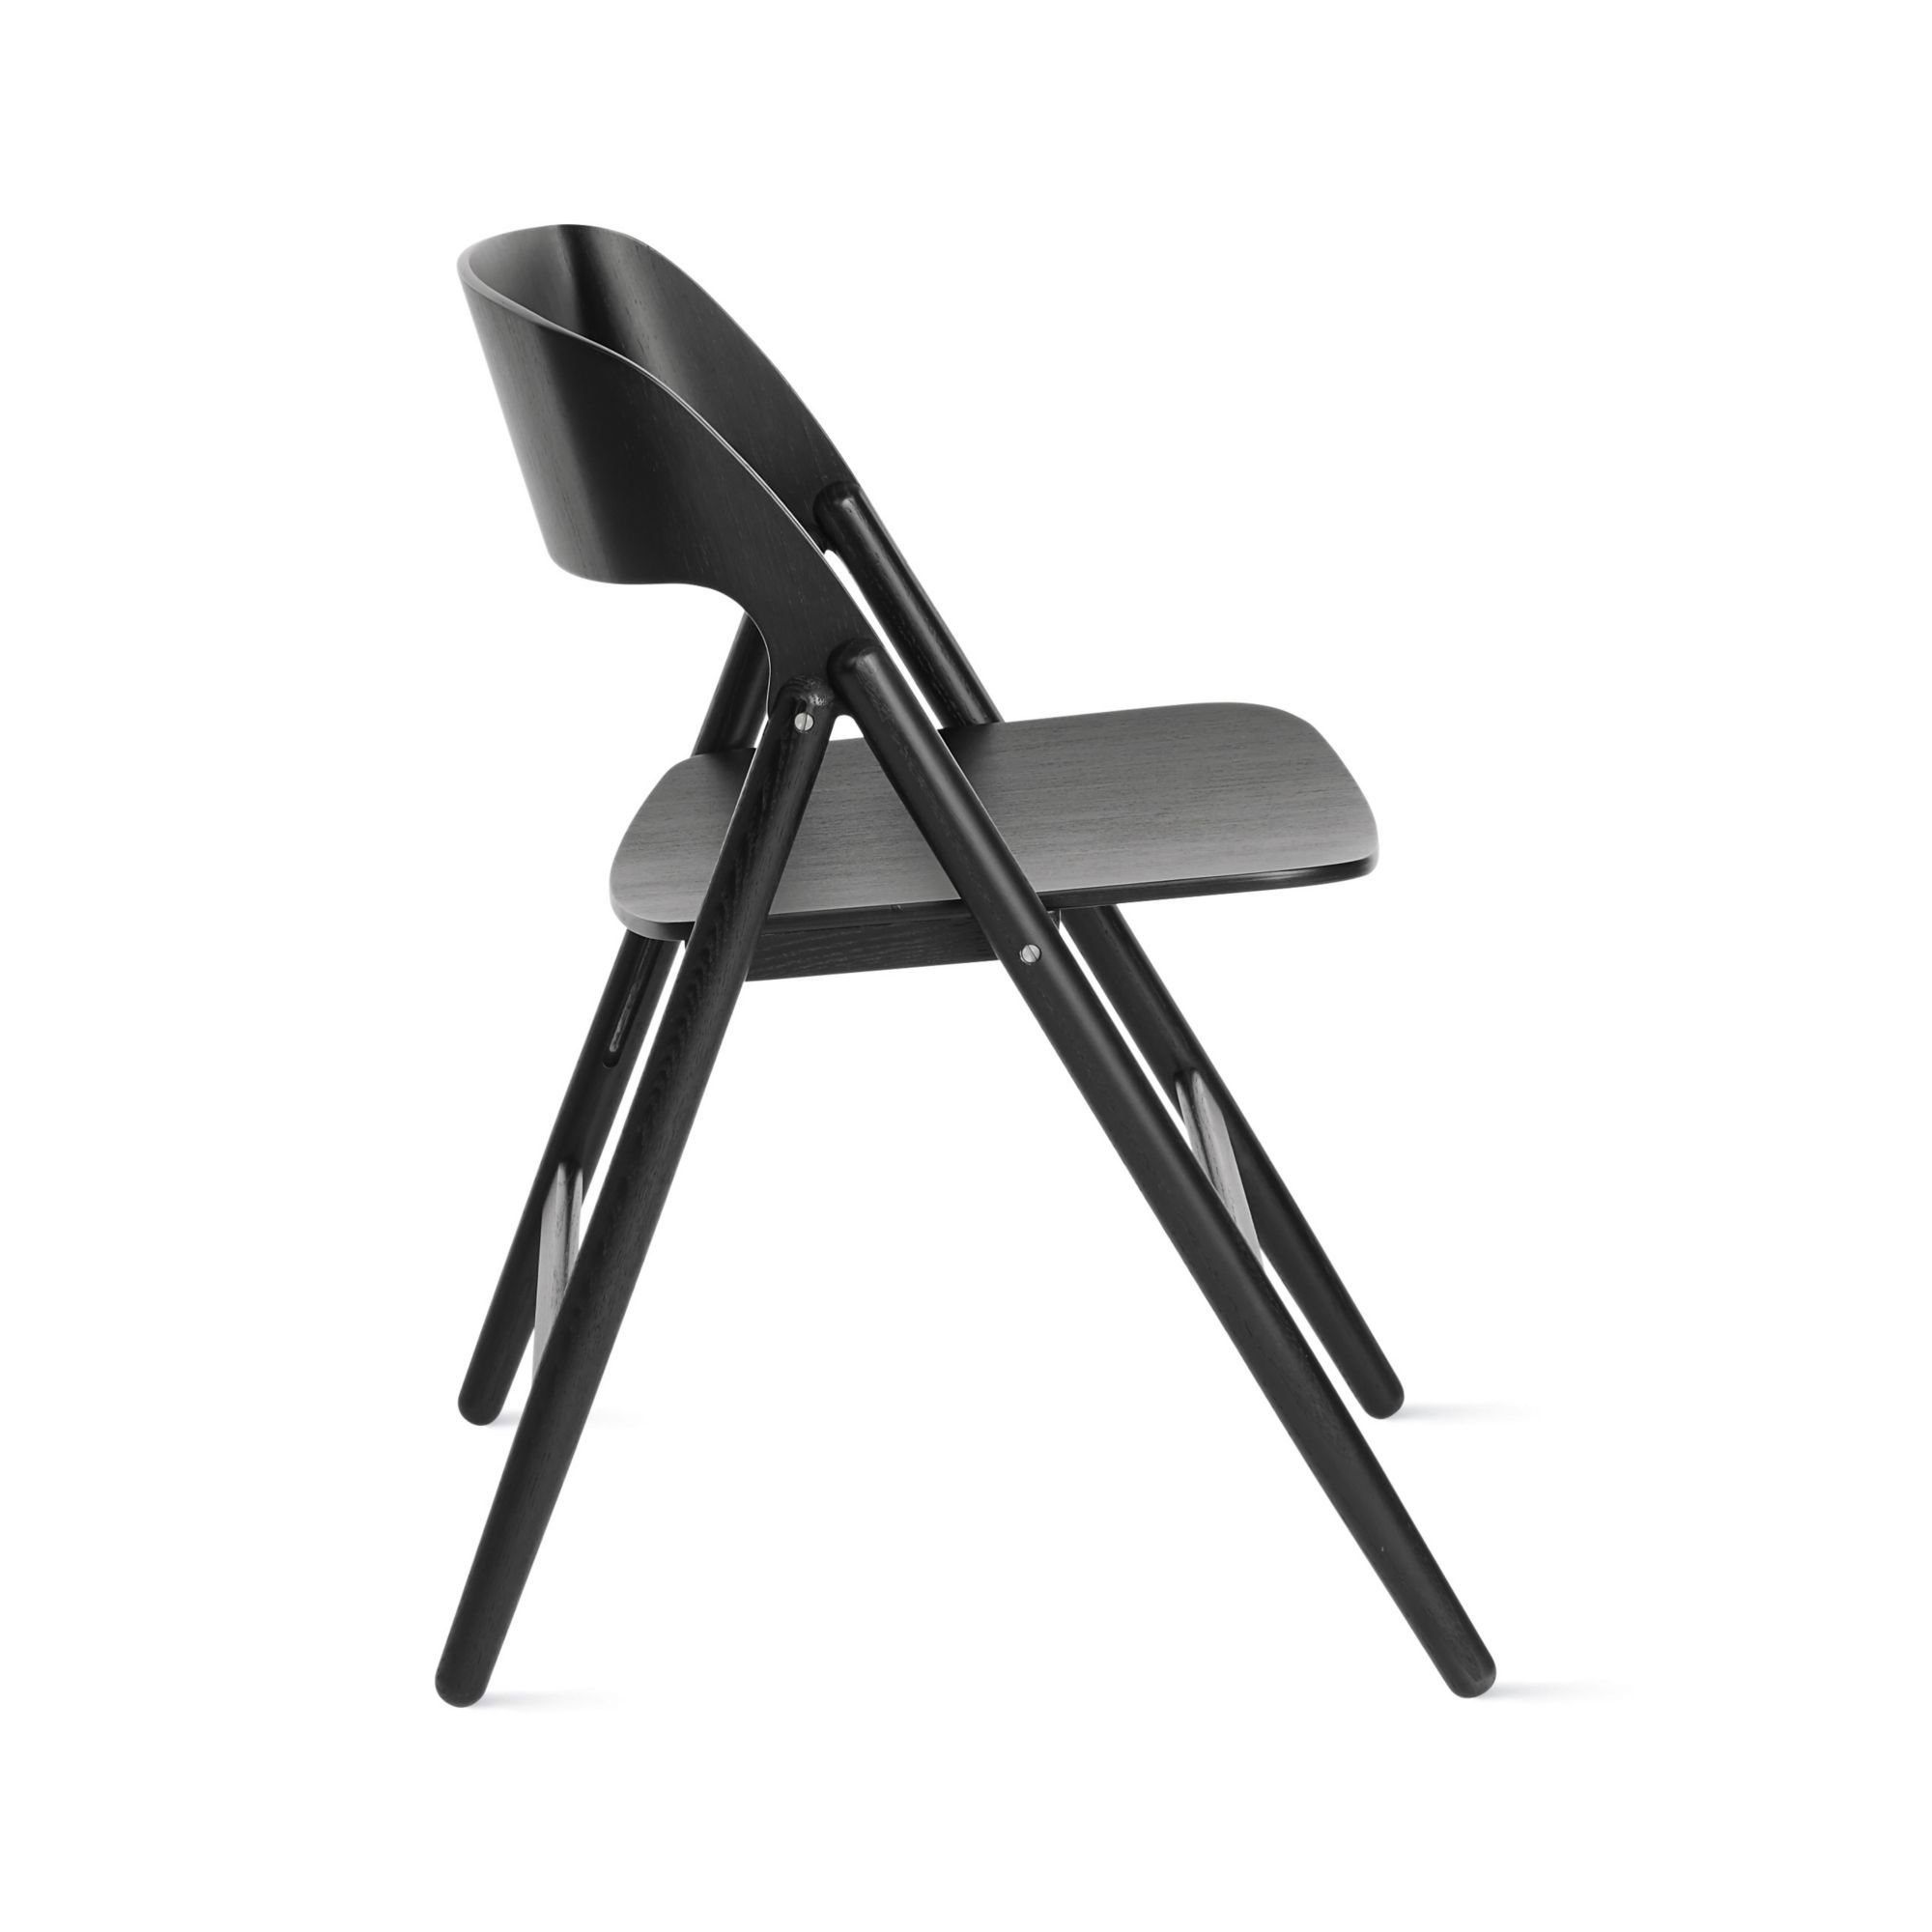 Phenomenal Design Within Reach Narin Folding Chair E Power Catamaran Uwap Interior Chair Design Uwaporg